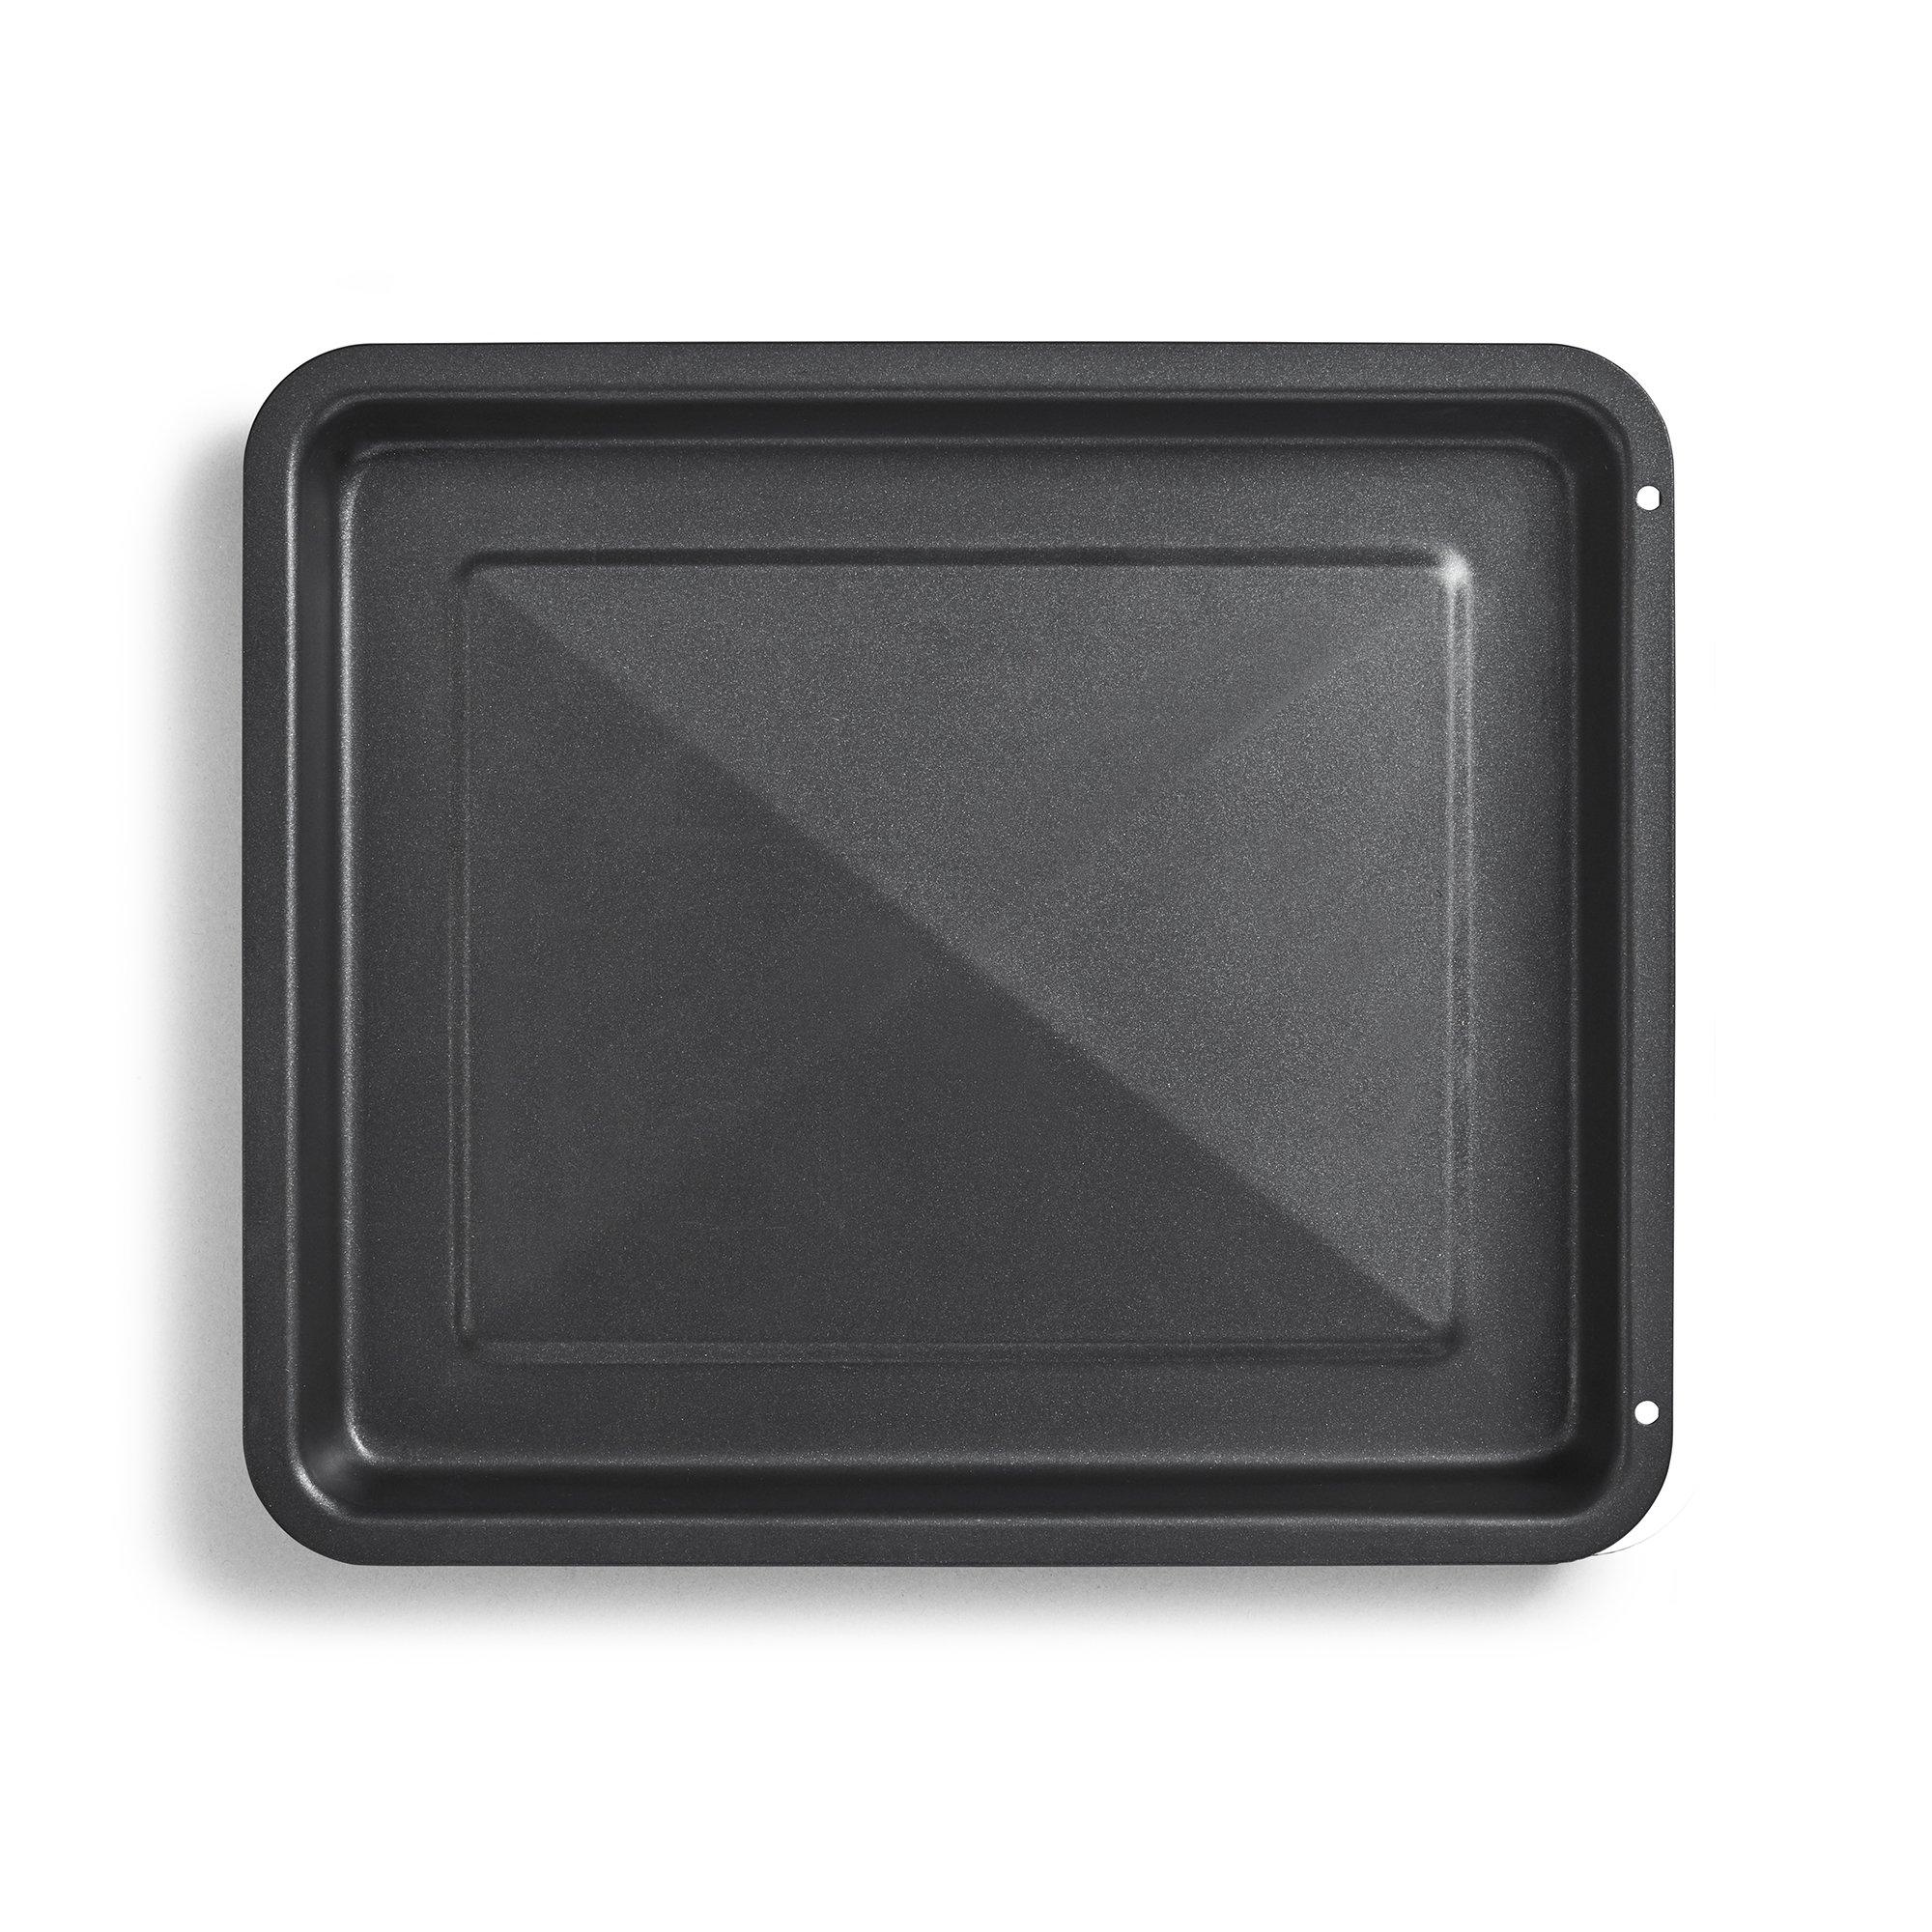 Calphalon Quartz Heat & Precision Control Countertop Oven Replacement Baking Pan